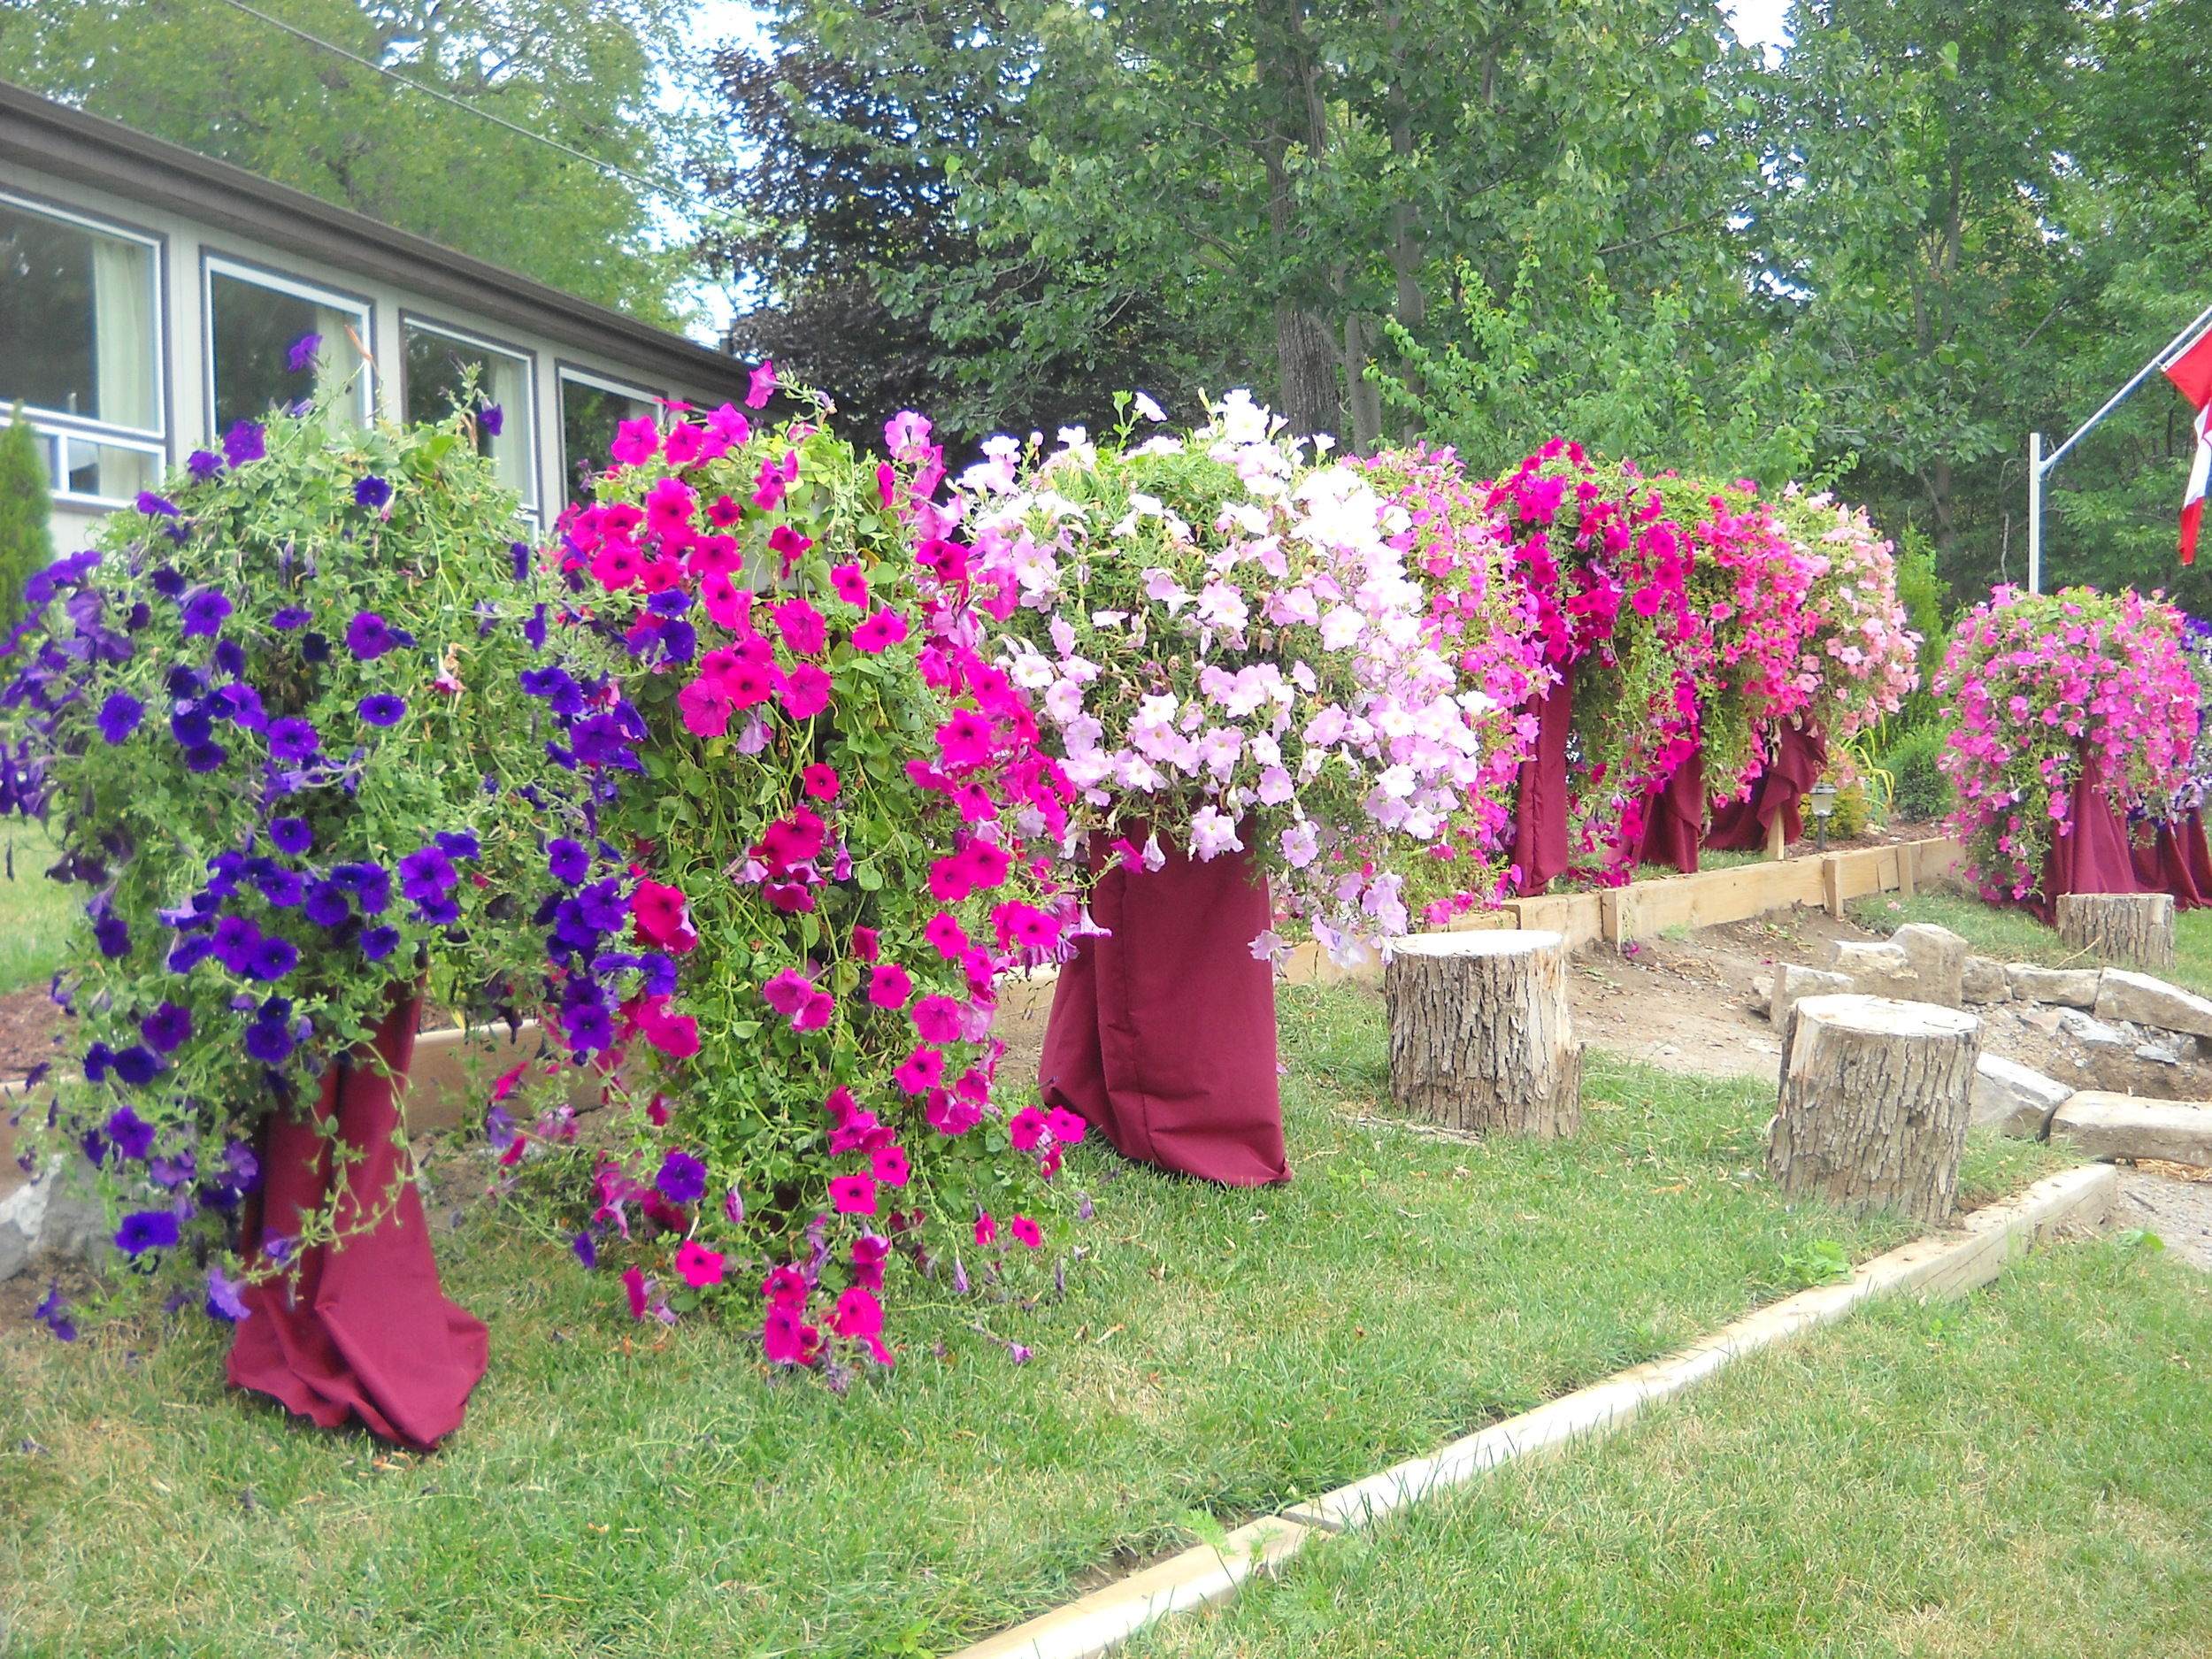 Wedding Venue - Flower Arrangements for Wedding Ceremony